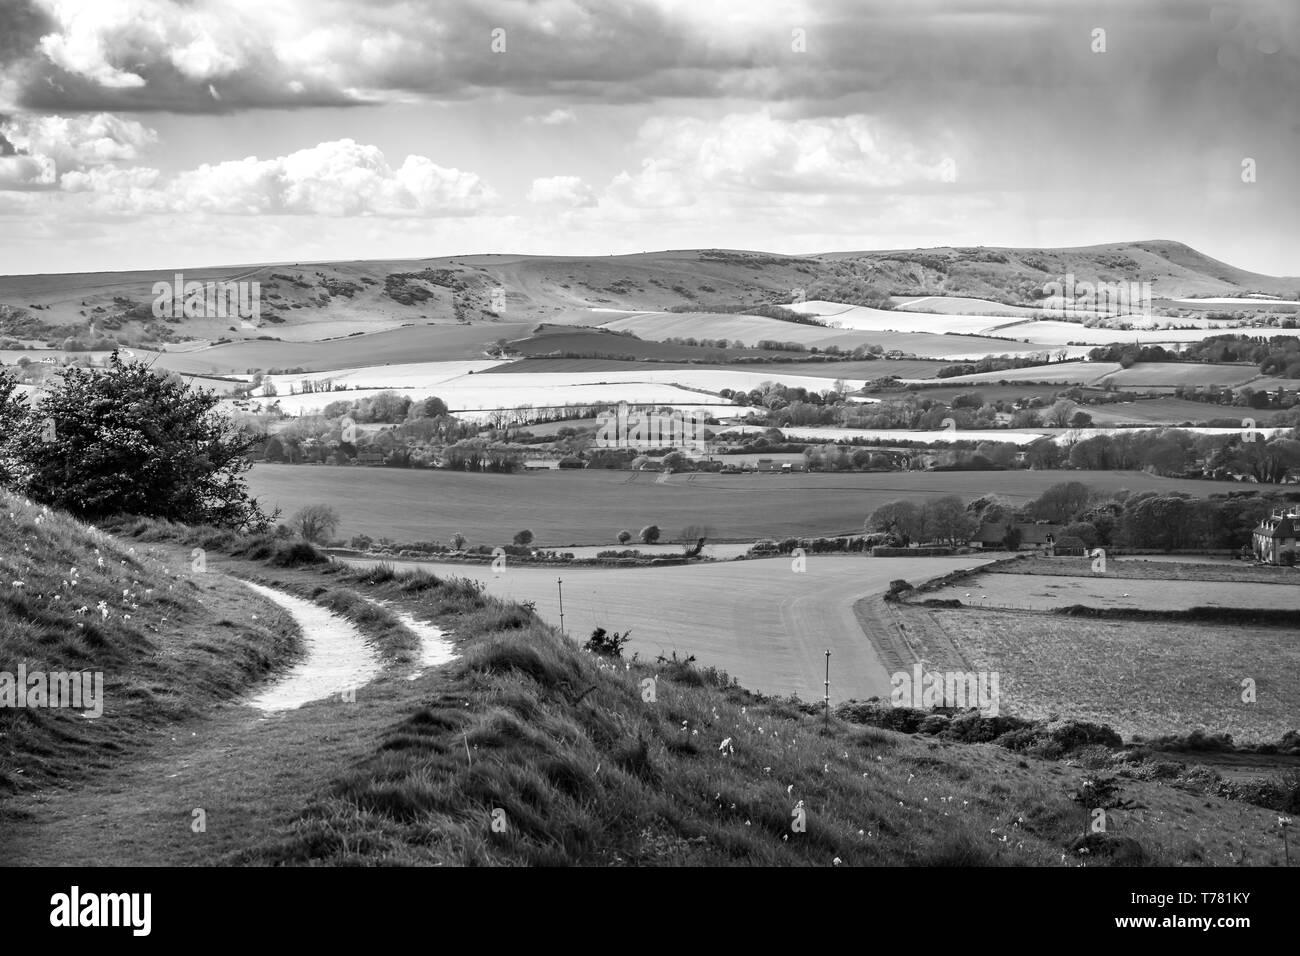 Track leading around downland hills - Stock Image